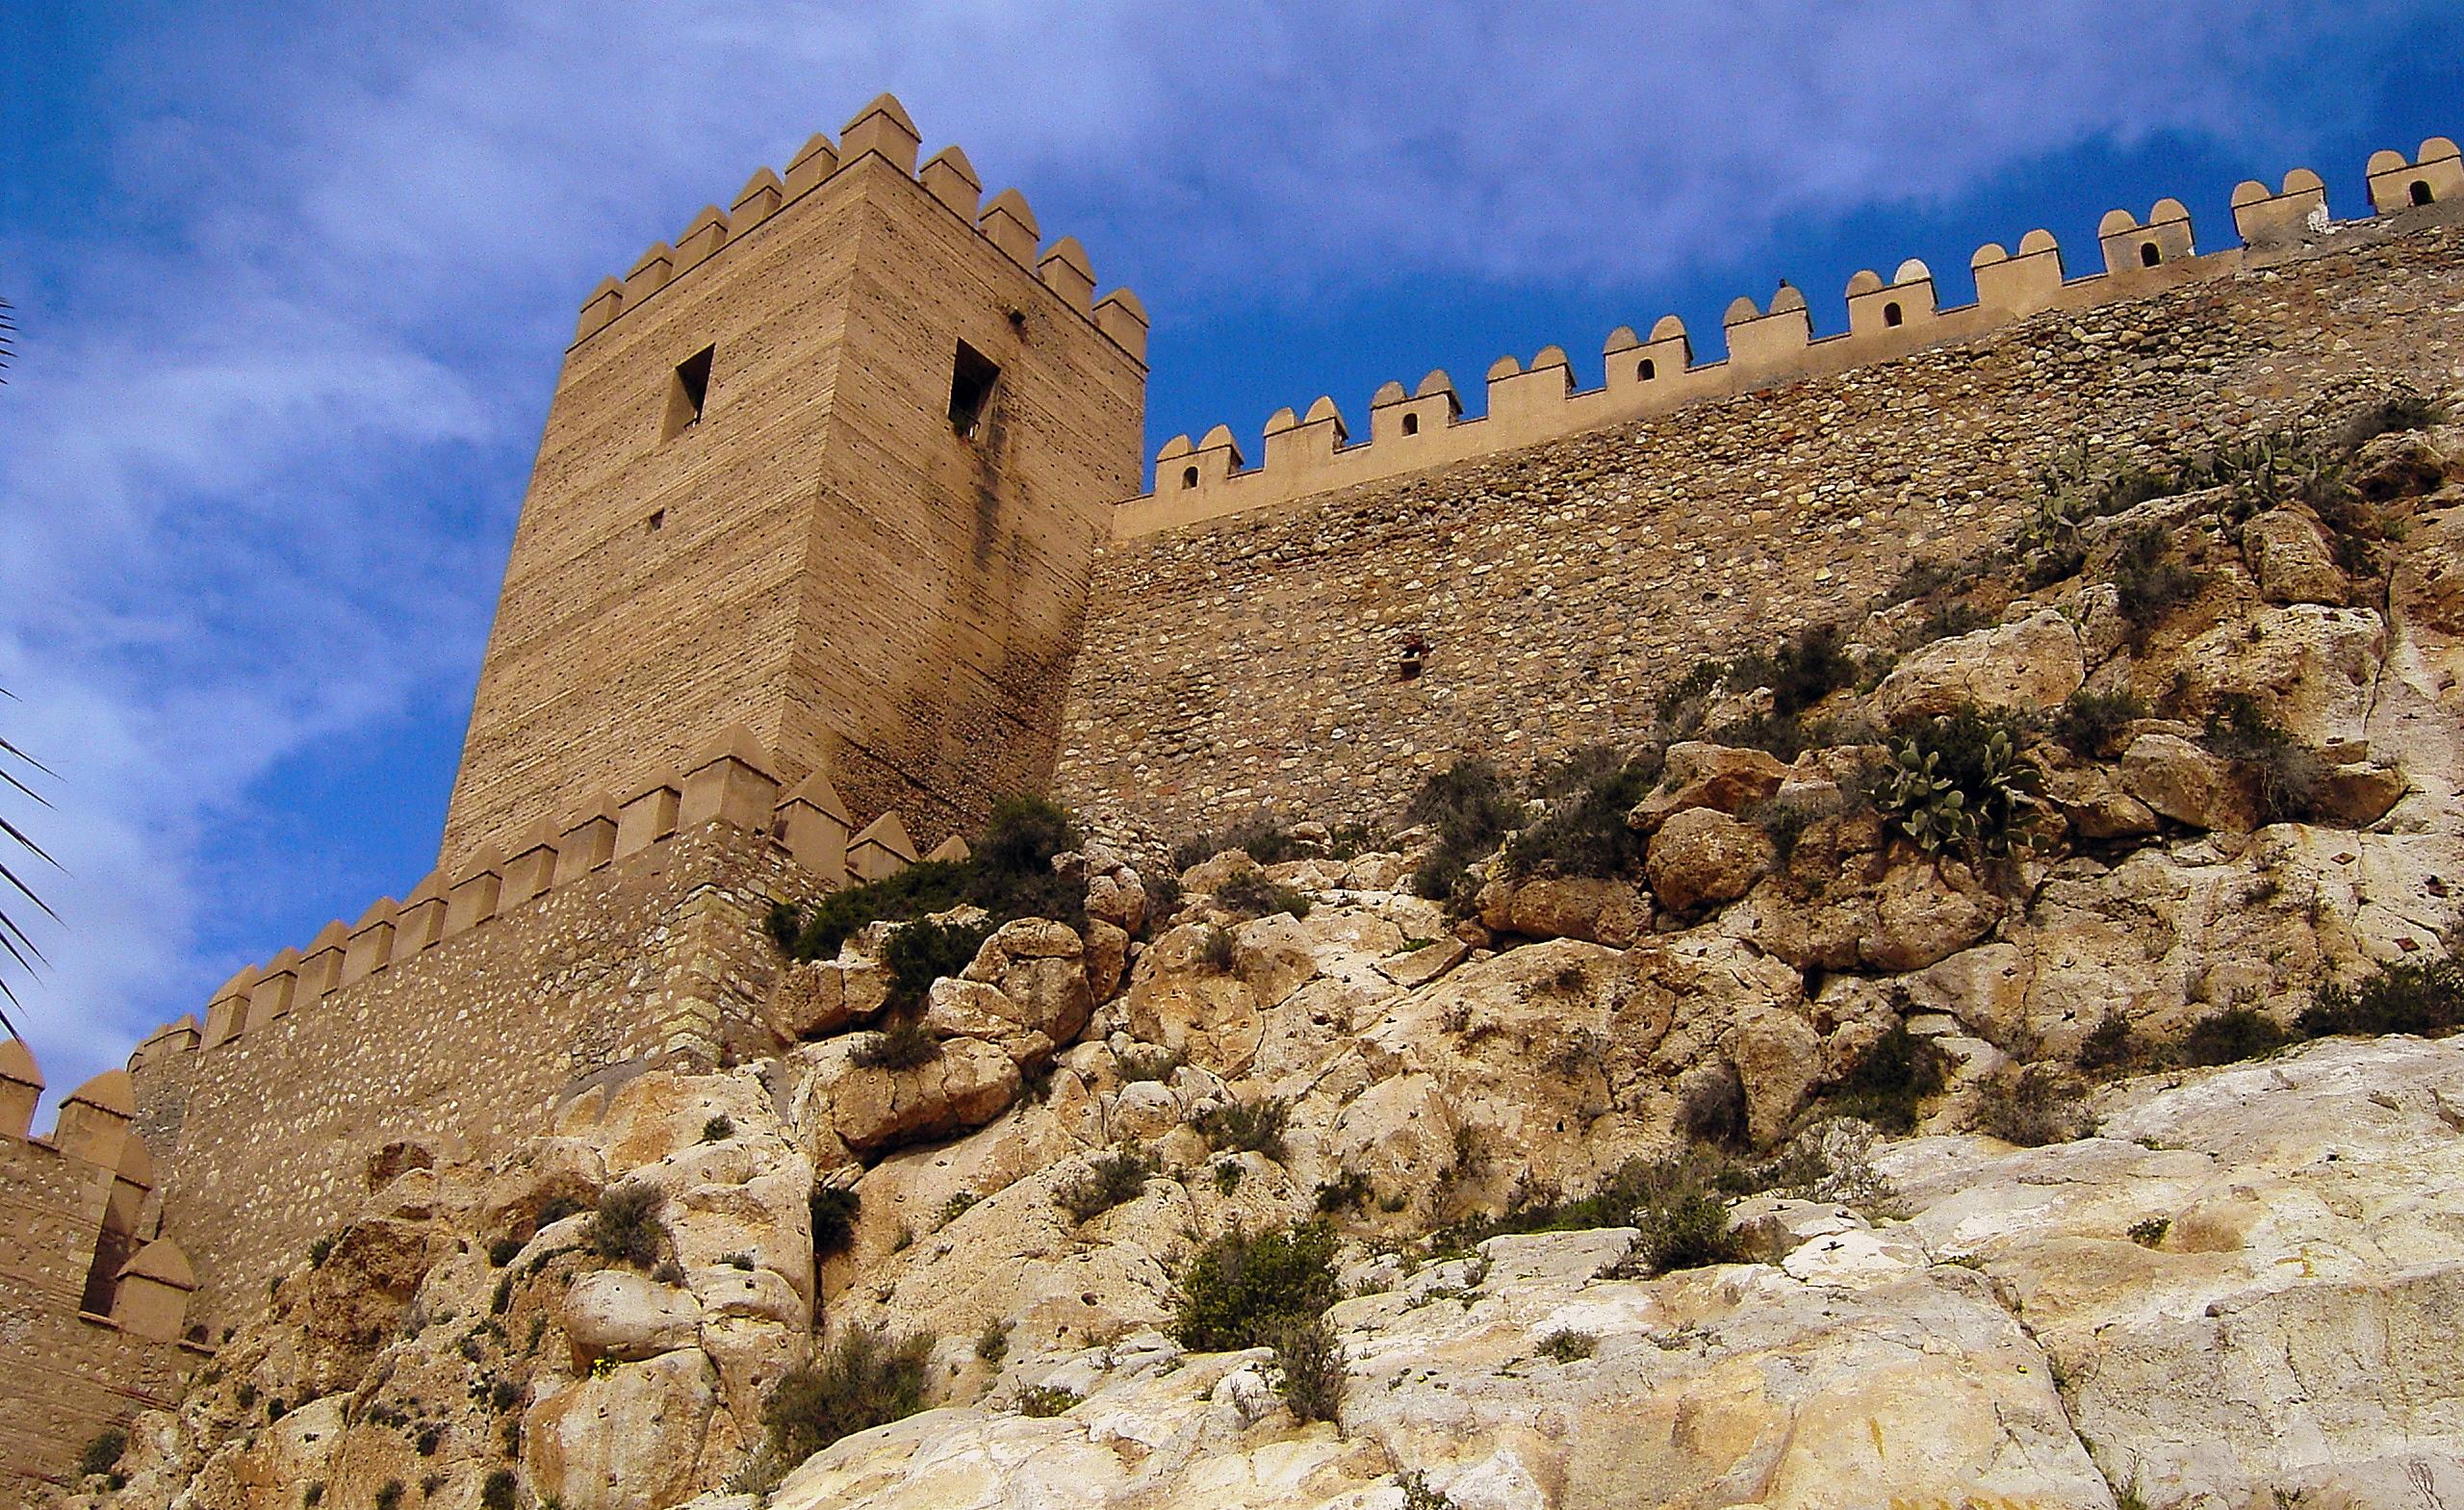 File:Alcazaba Almería 007.JPG - Wikimedia Commons